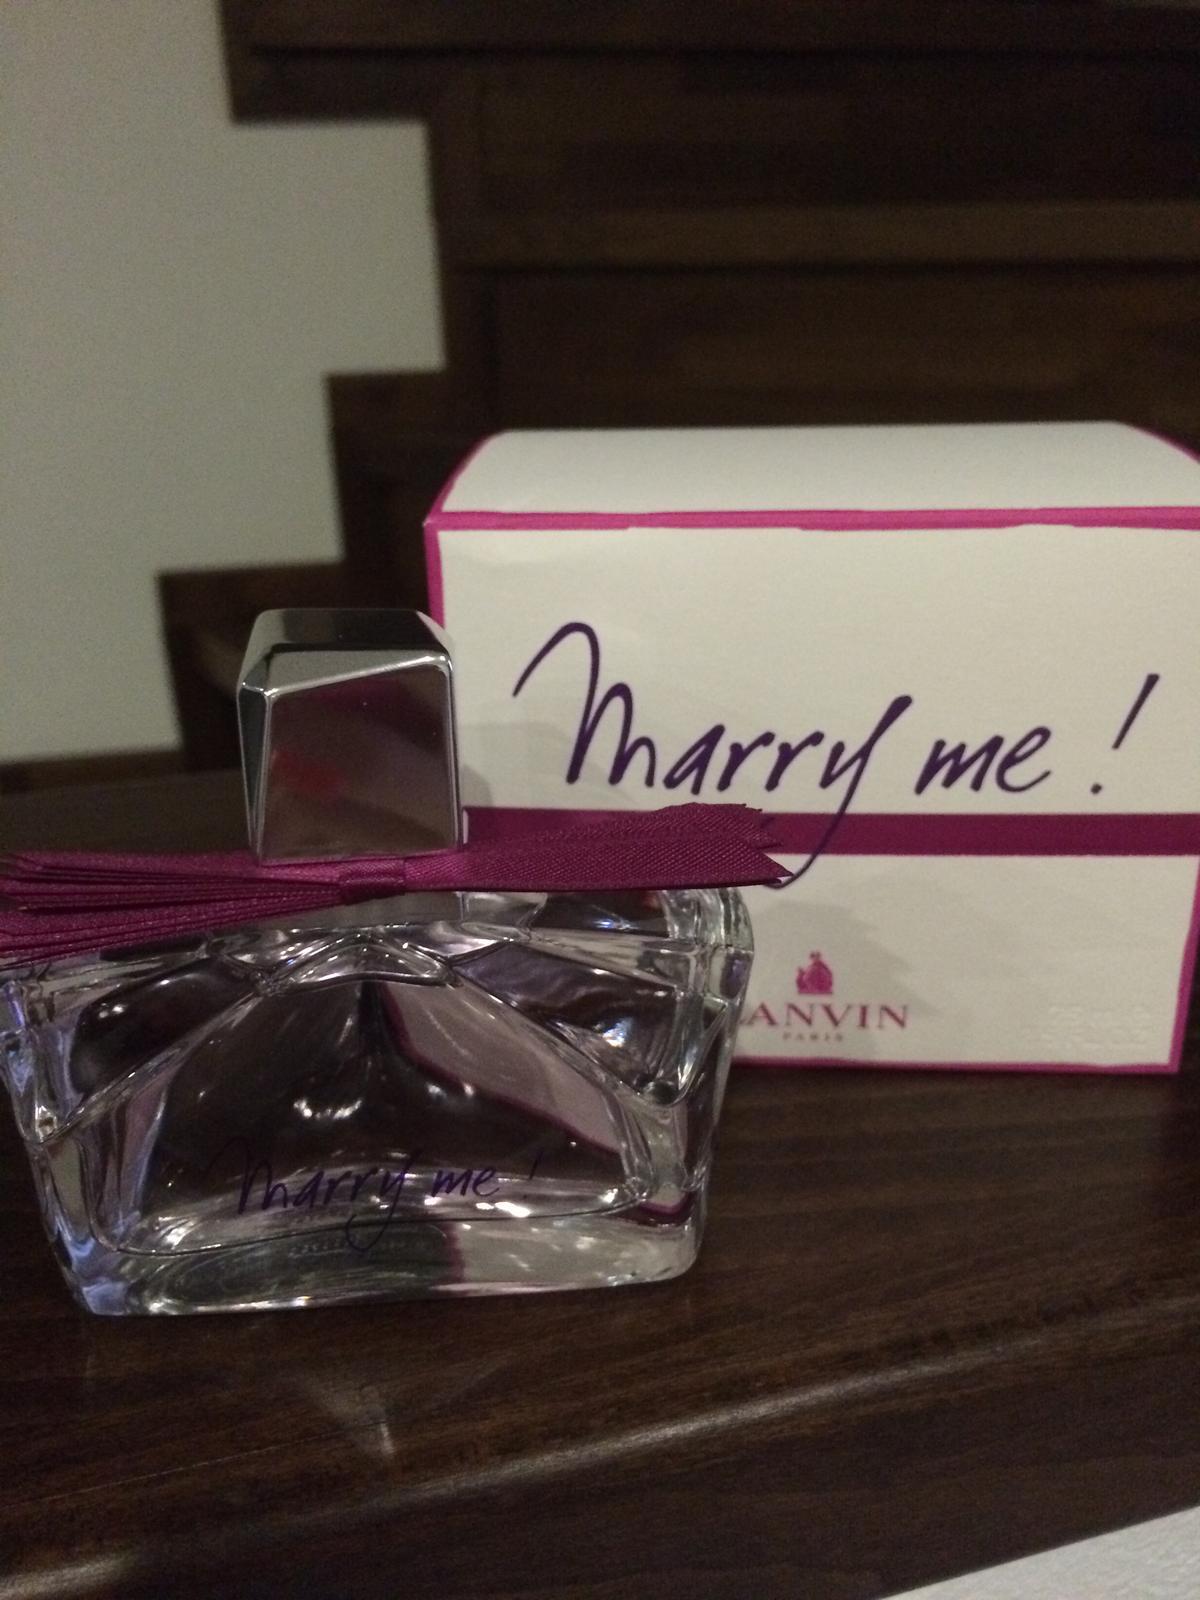 Svadba 26.09.2015 - Ospevovala som tento parfem a drahy mi ho kupil :-) inak vraj sa tieto vonavocky prestavaju vyrabat.. Tak sup sup zienky kupovat na svadbu kym je :-))